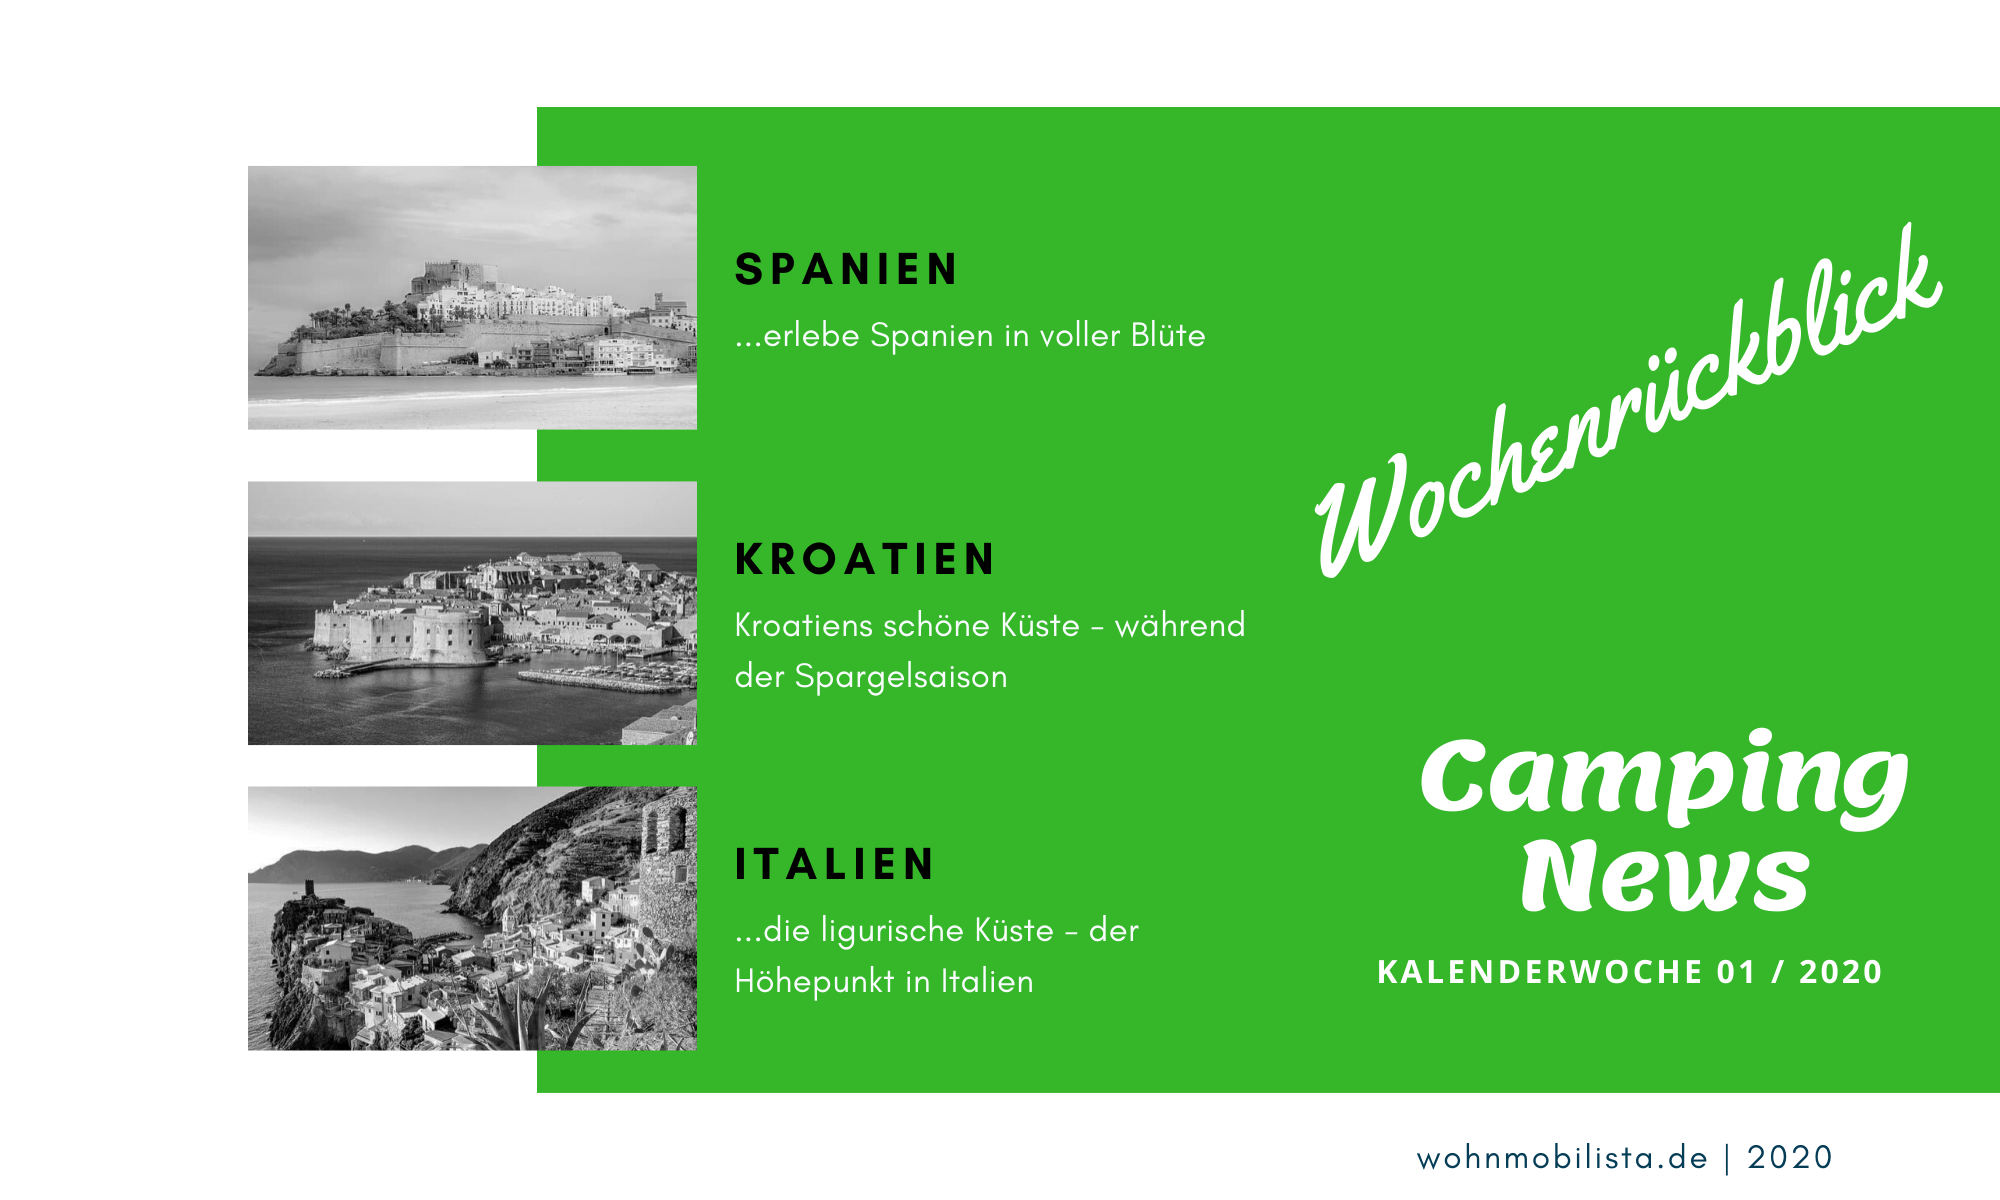 Wochenrückblick Camping News KW01-2020